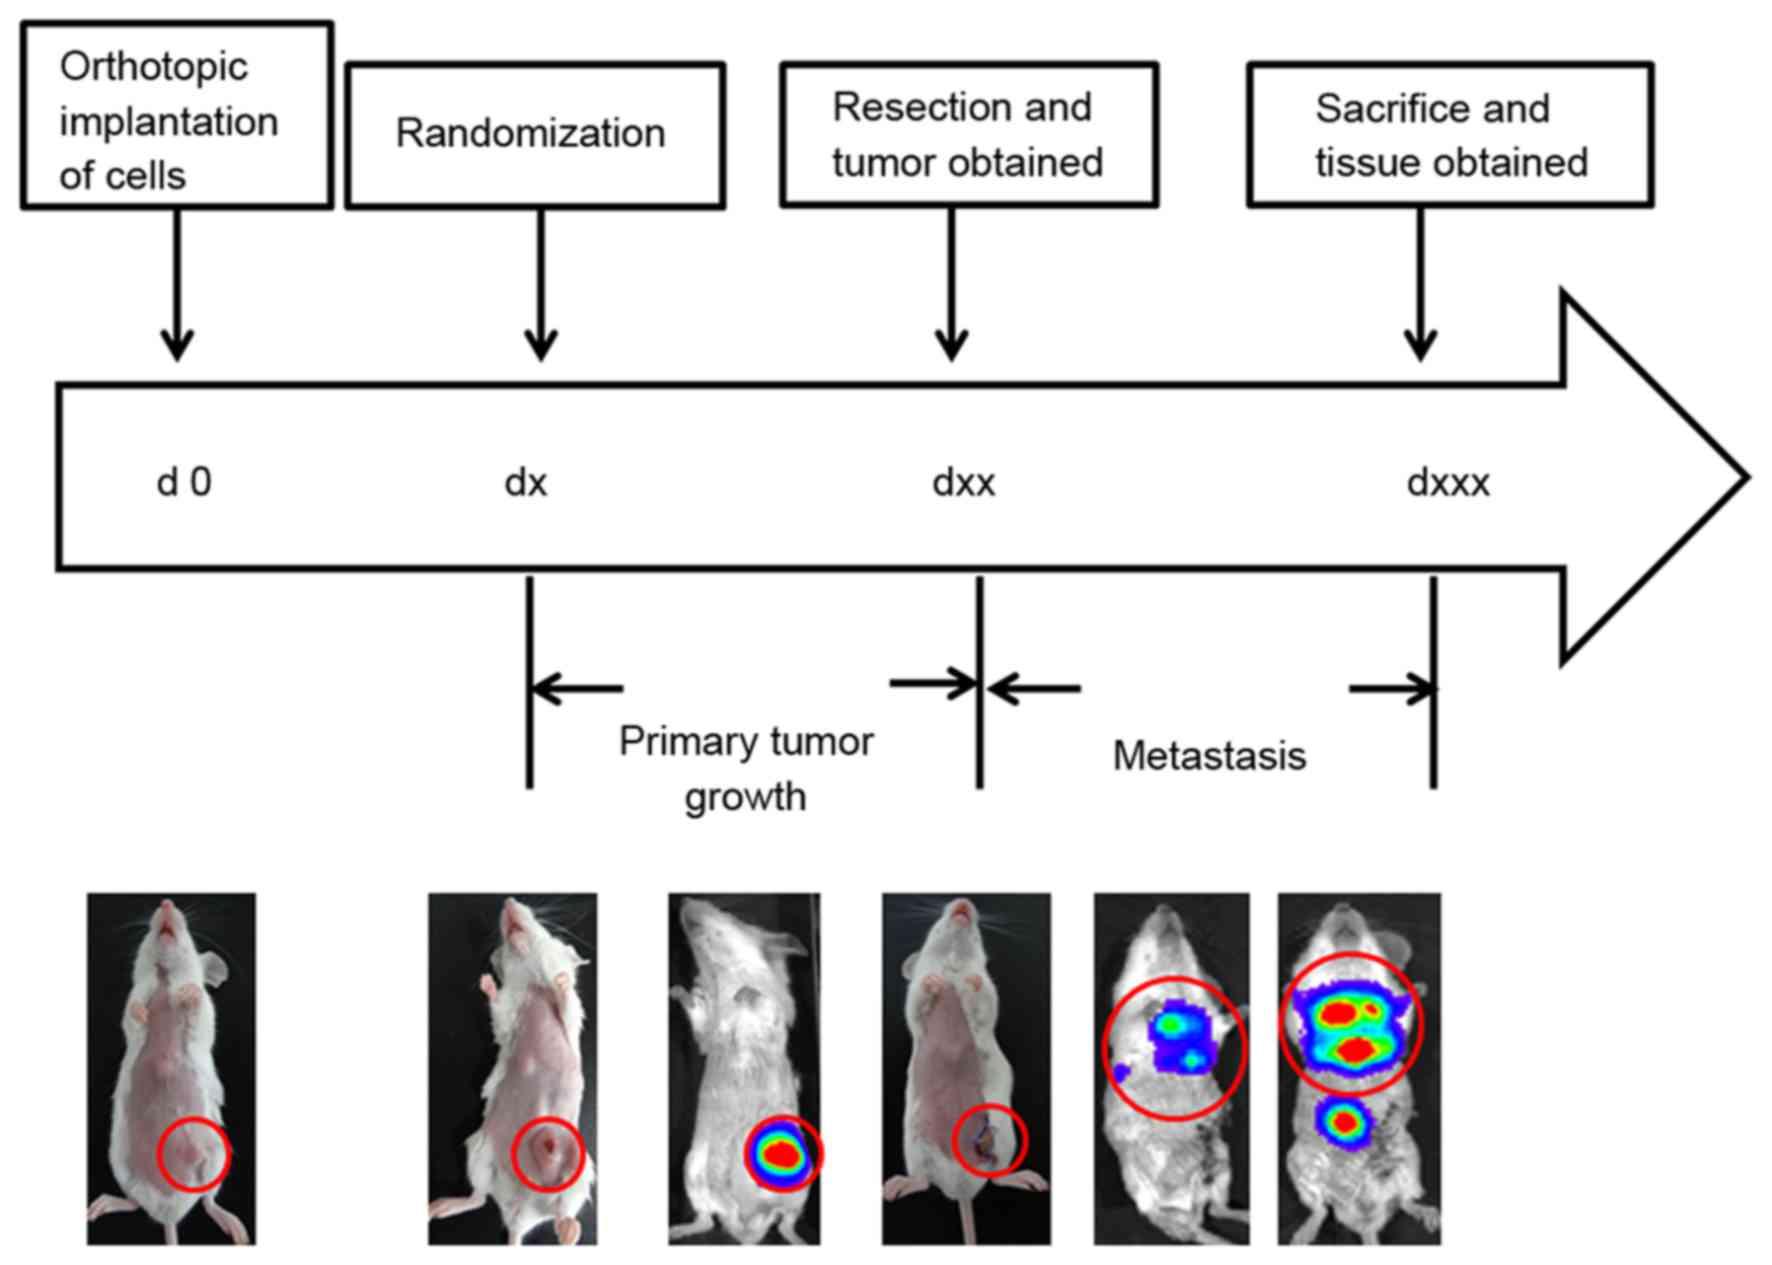 Loss of Tsc2 in PyMT mice increases pulmonary metastasis